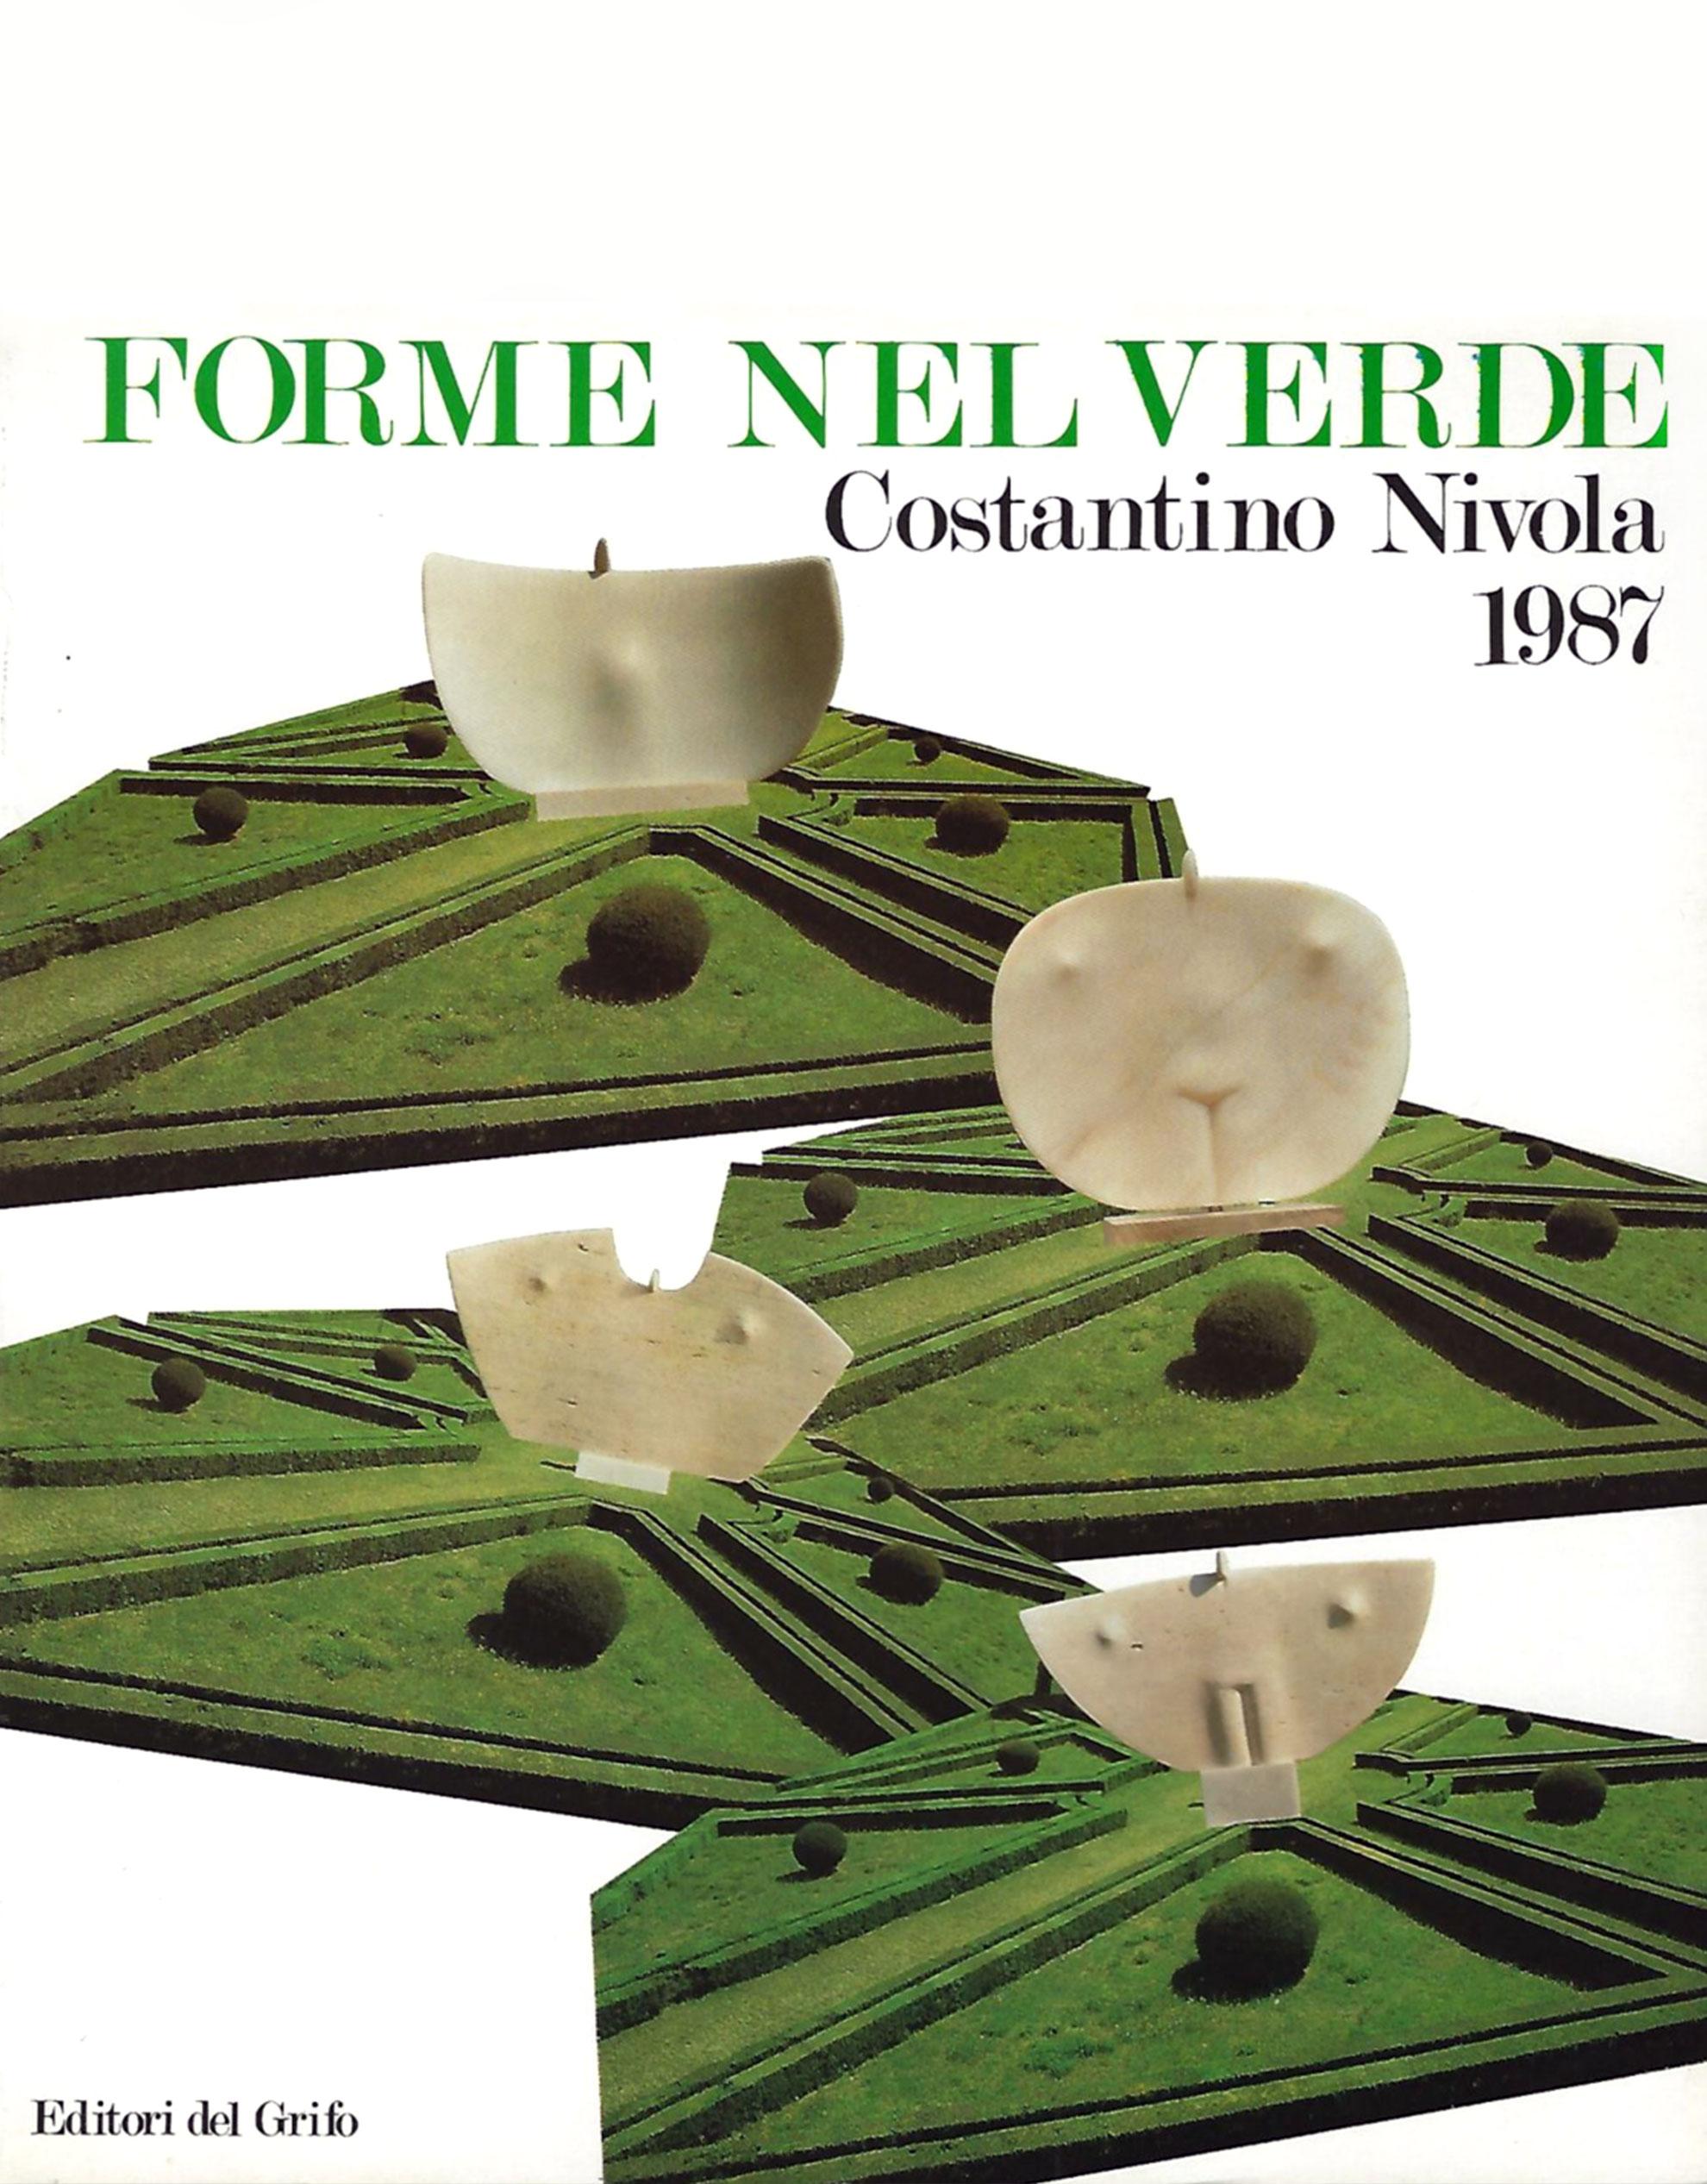 Catalogo Forme nel Verde 1987